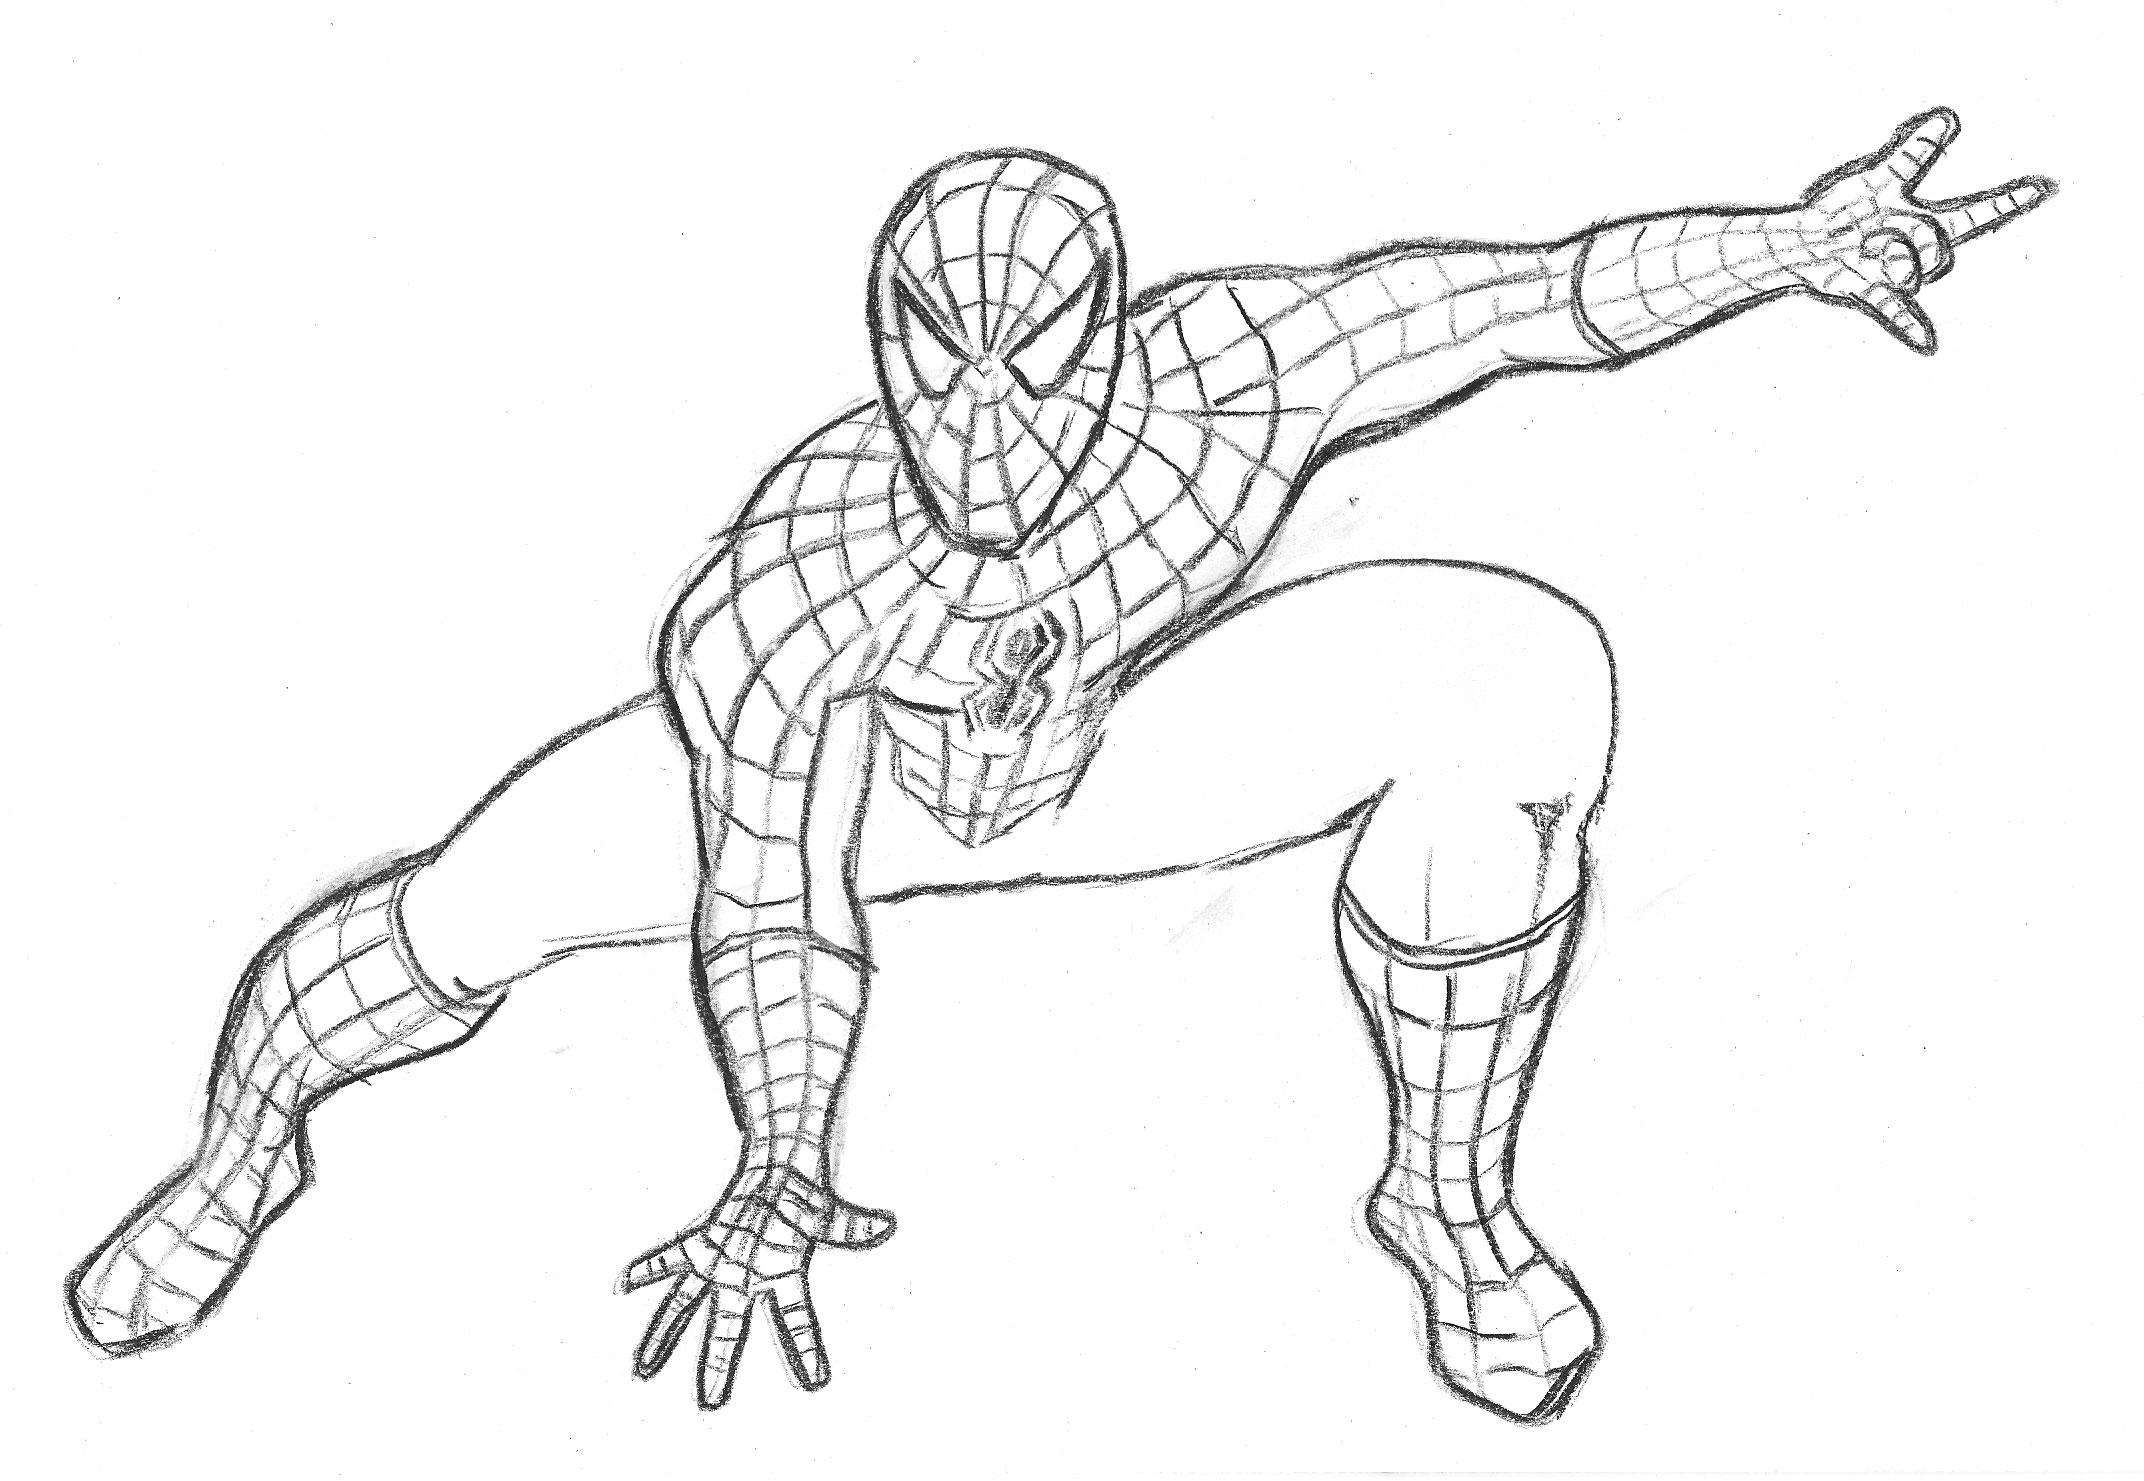 Coloriages A Imprimer Spiderman Numero 61272